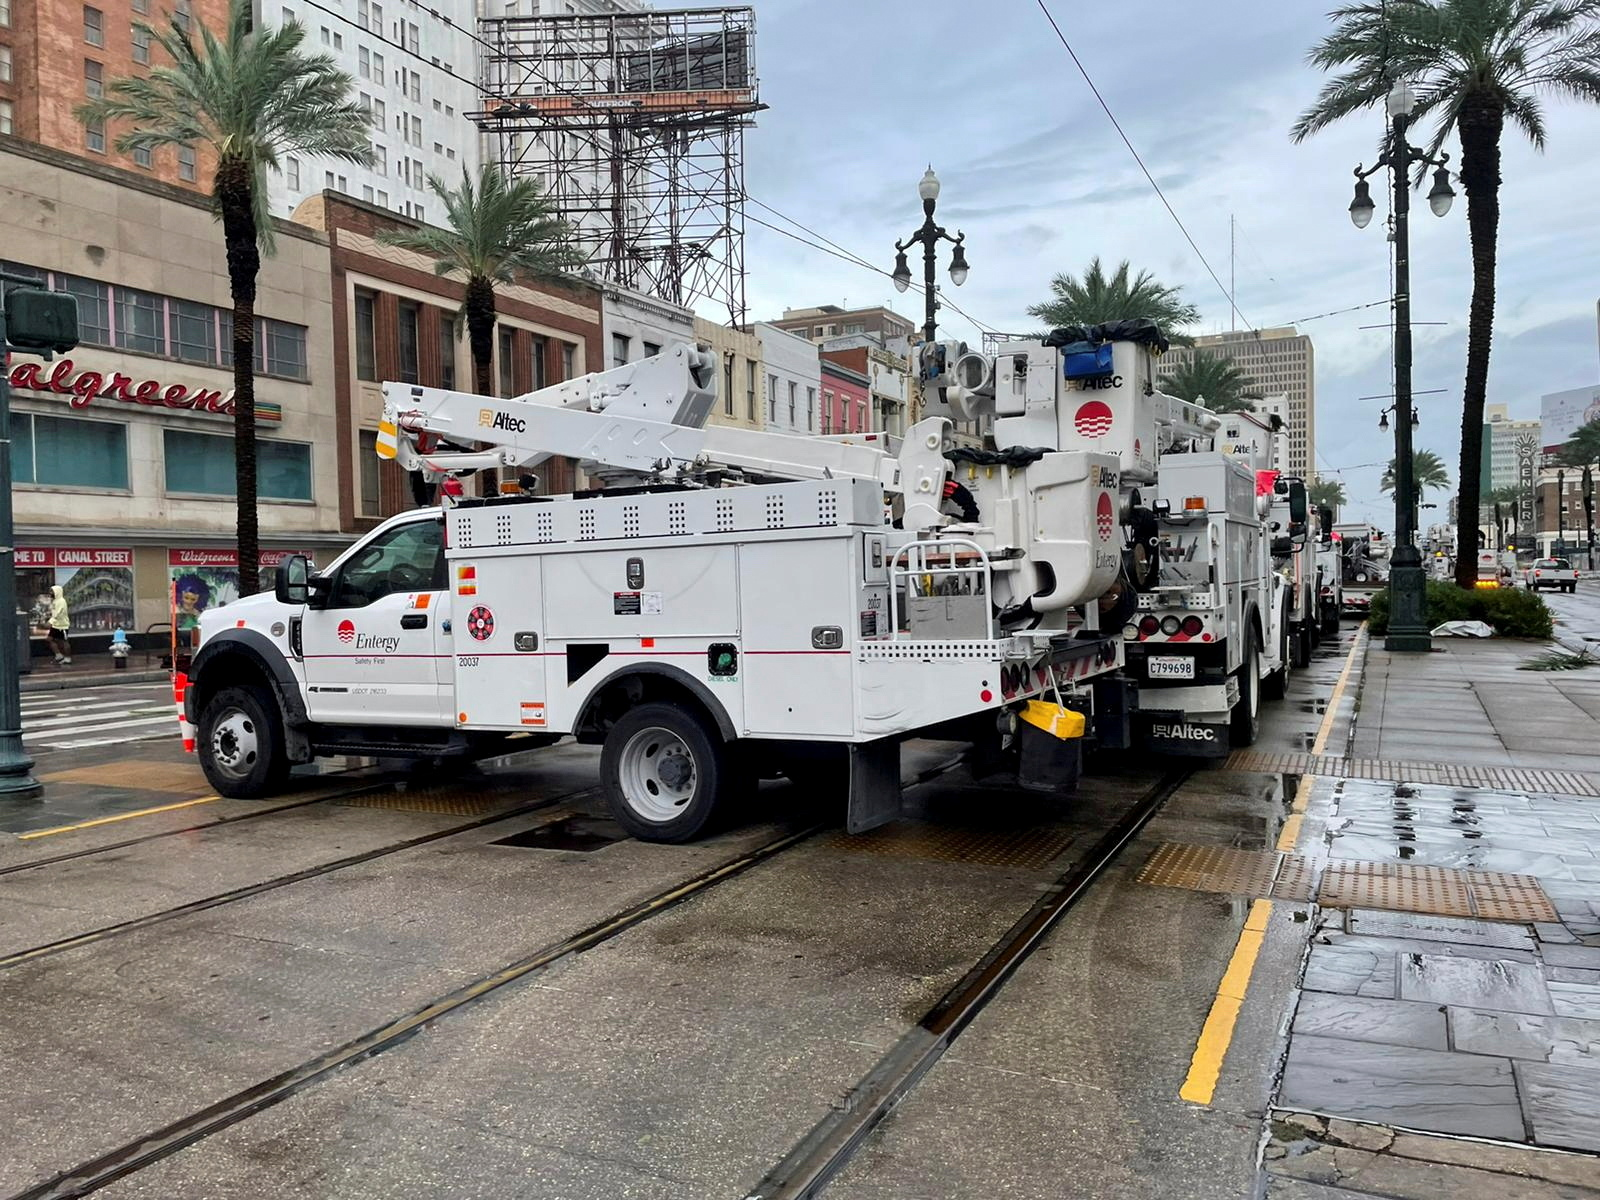 Energy power crews work to restore power after Hurricane Ida struck New Orleans, Louisiana, U.S., August 30, 2021. REUTERS/Devika Krishna Kumar